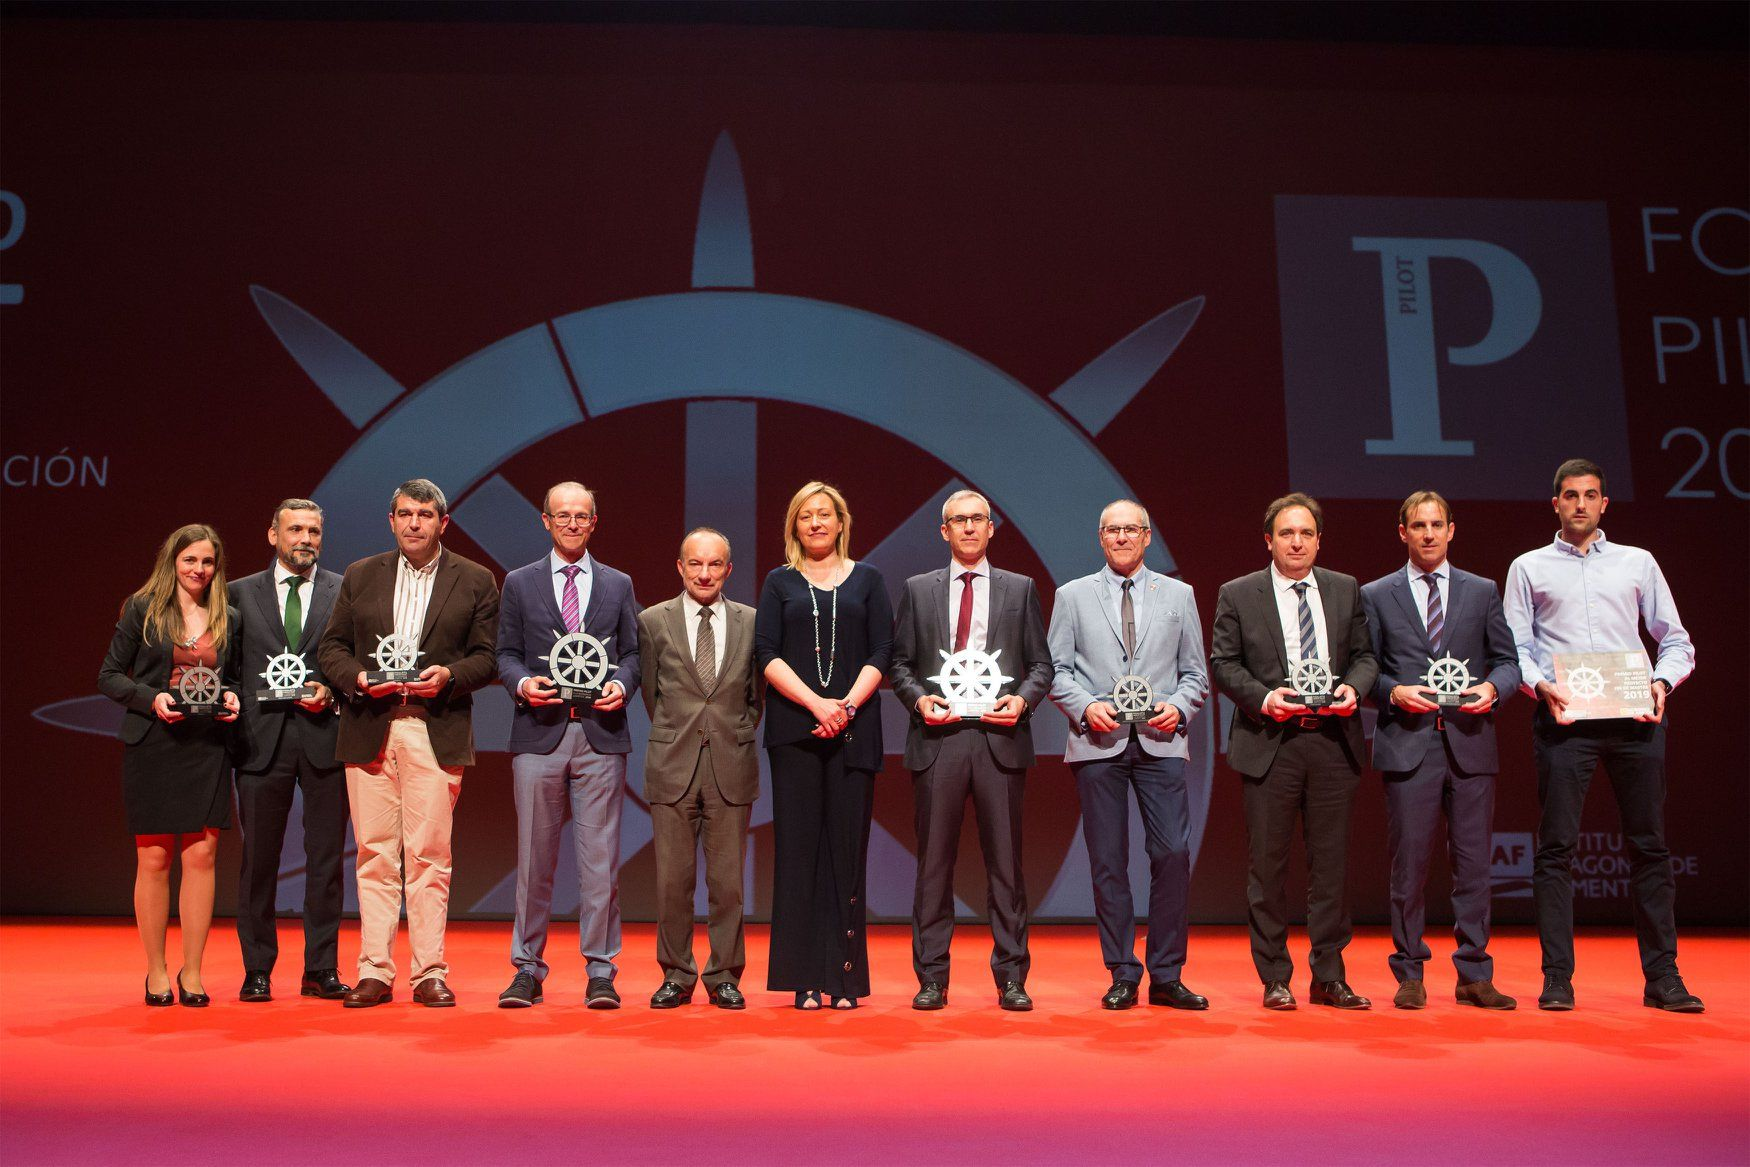 (Español) Agropal, finalista premios Pilot 2019